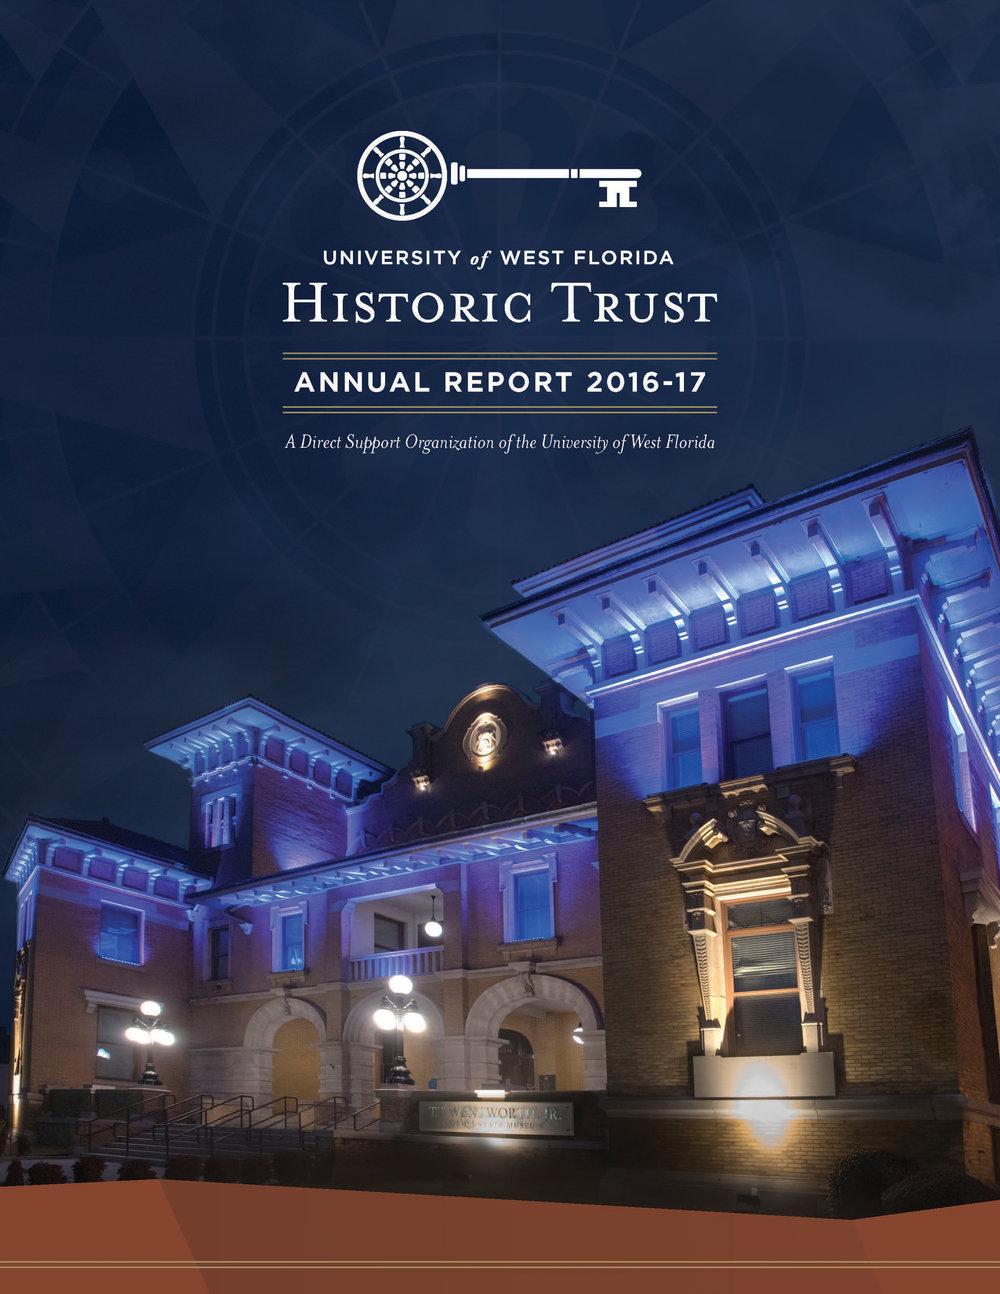 HistoricTrust_AnnualReport_2017_11_Page_1.jpg